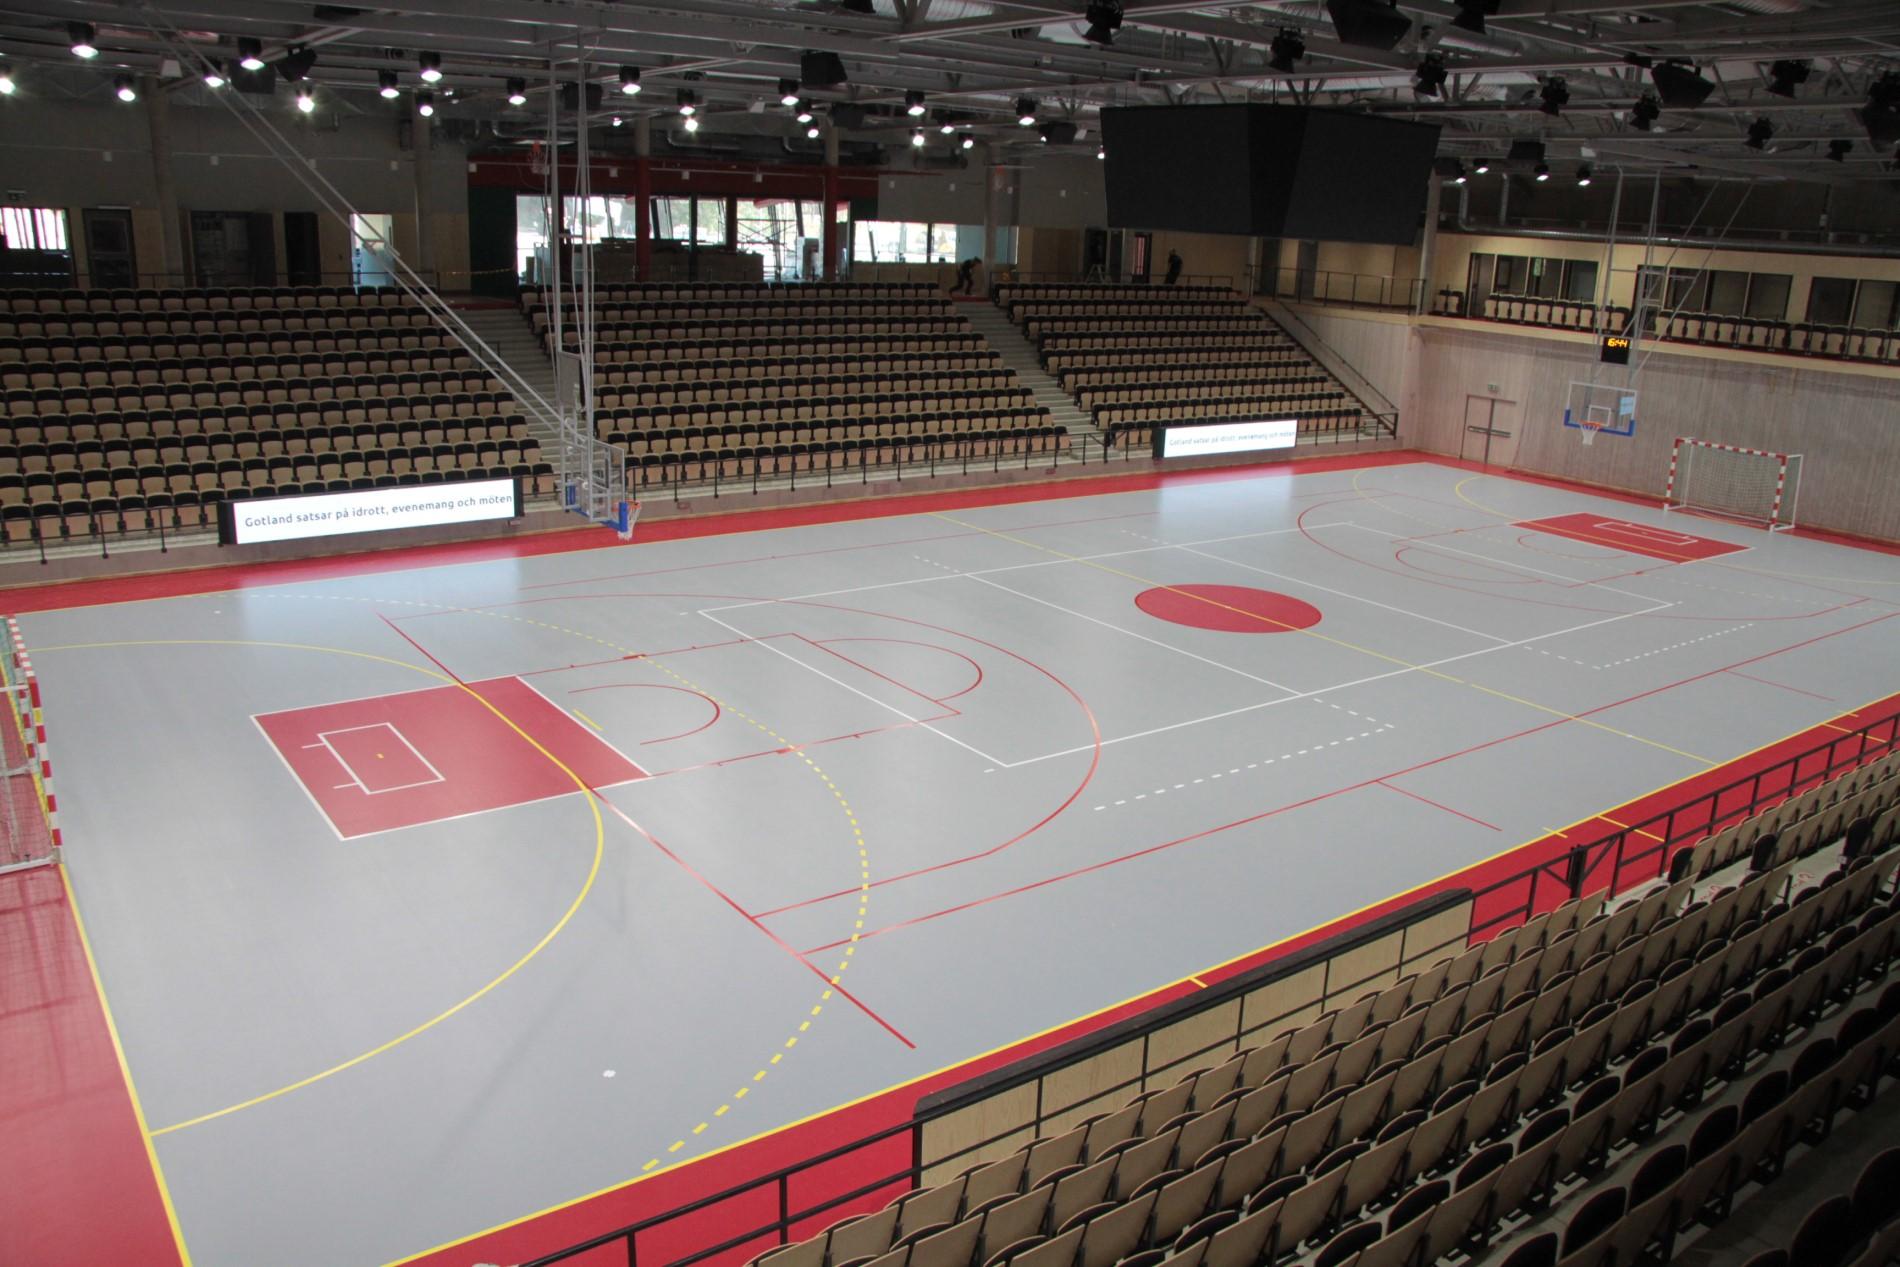 visborg arena gotland sportgolv läktarsystem unisport